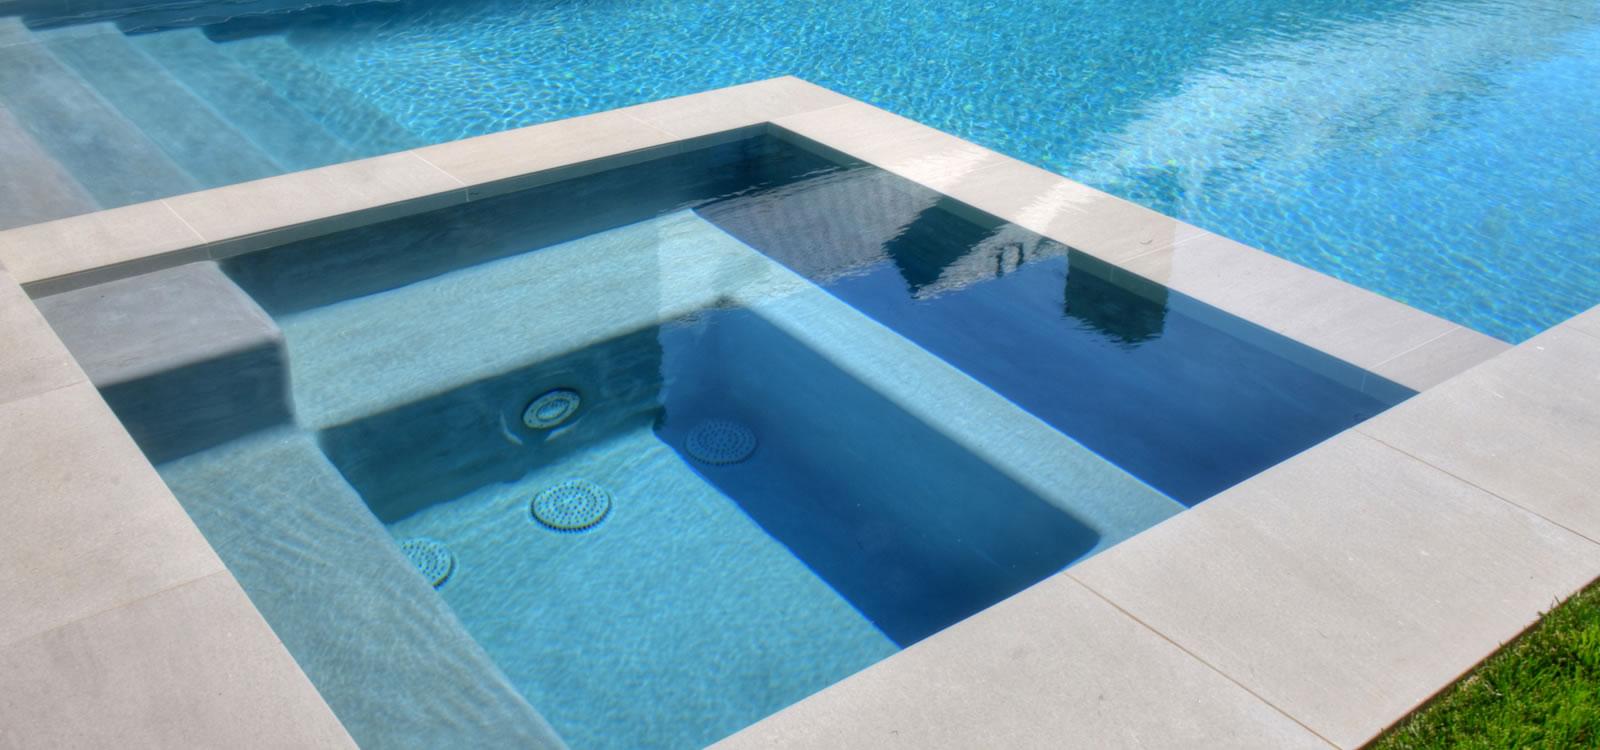 Santa Monica Pool U0026 Spa Design W/ Pool Cover